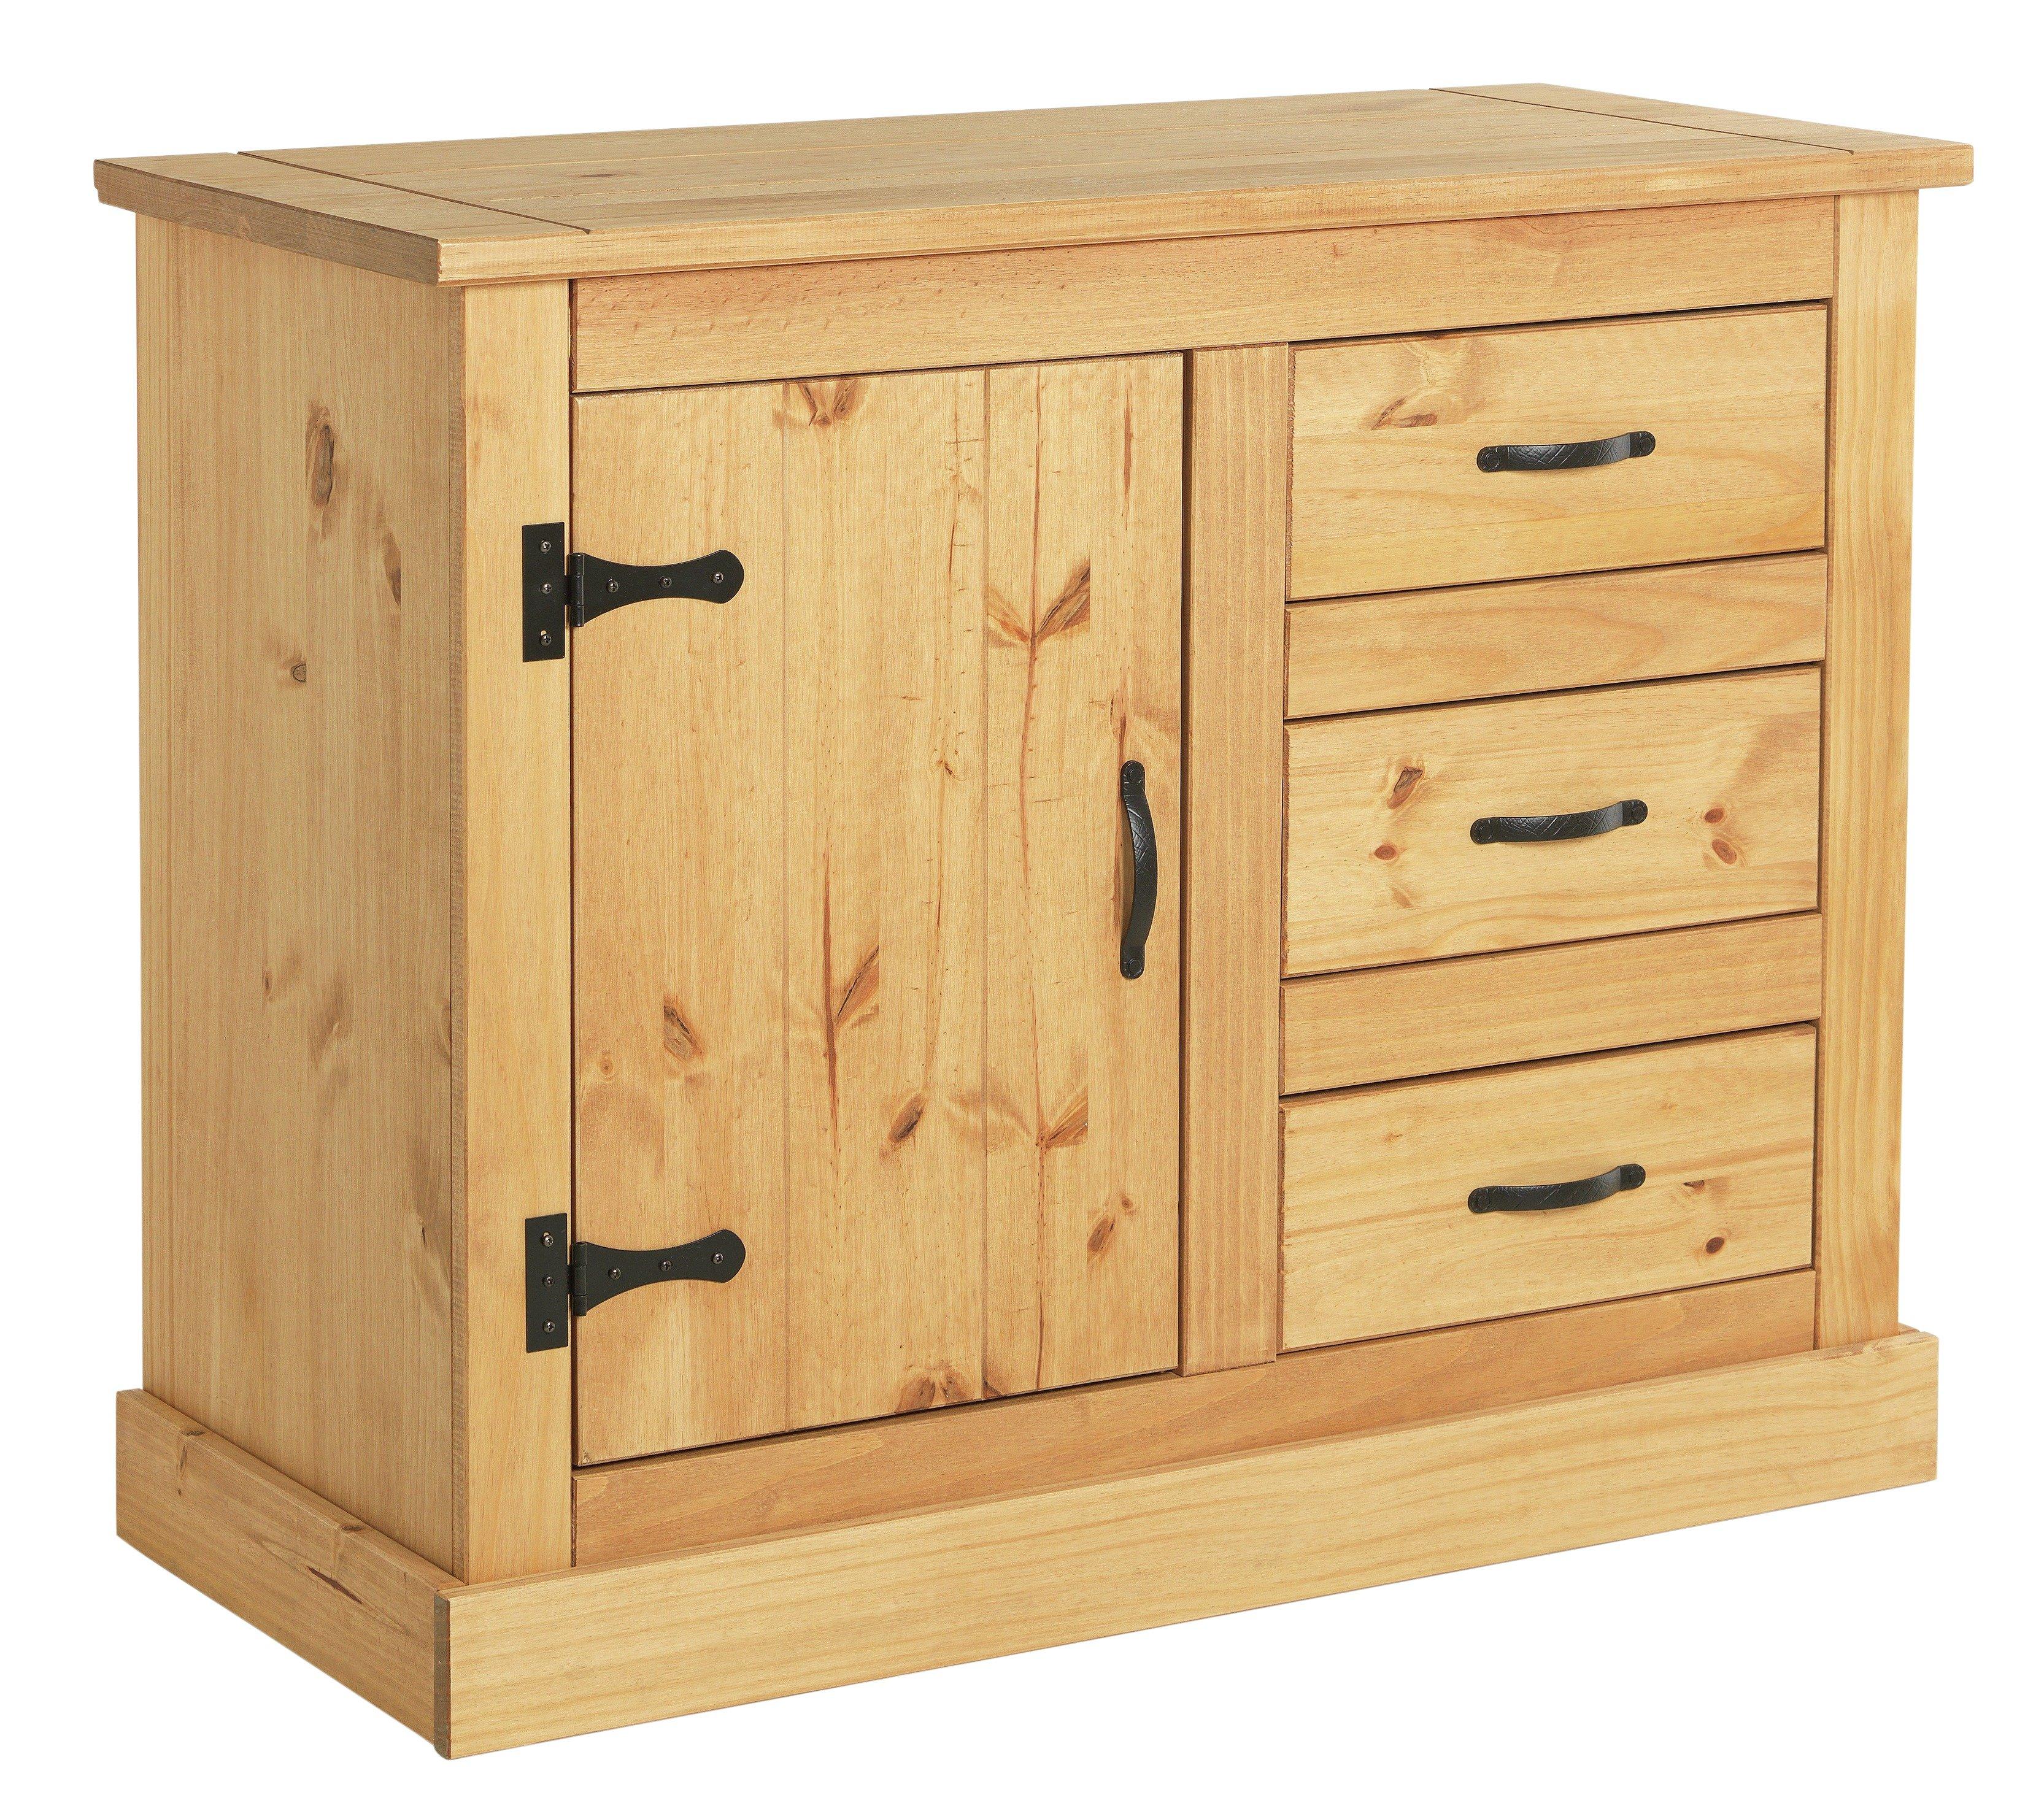 Argos Home San Diego 1 Door 3 Drawer Solid Pine Sideboard